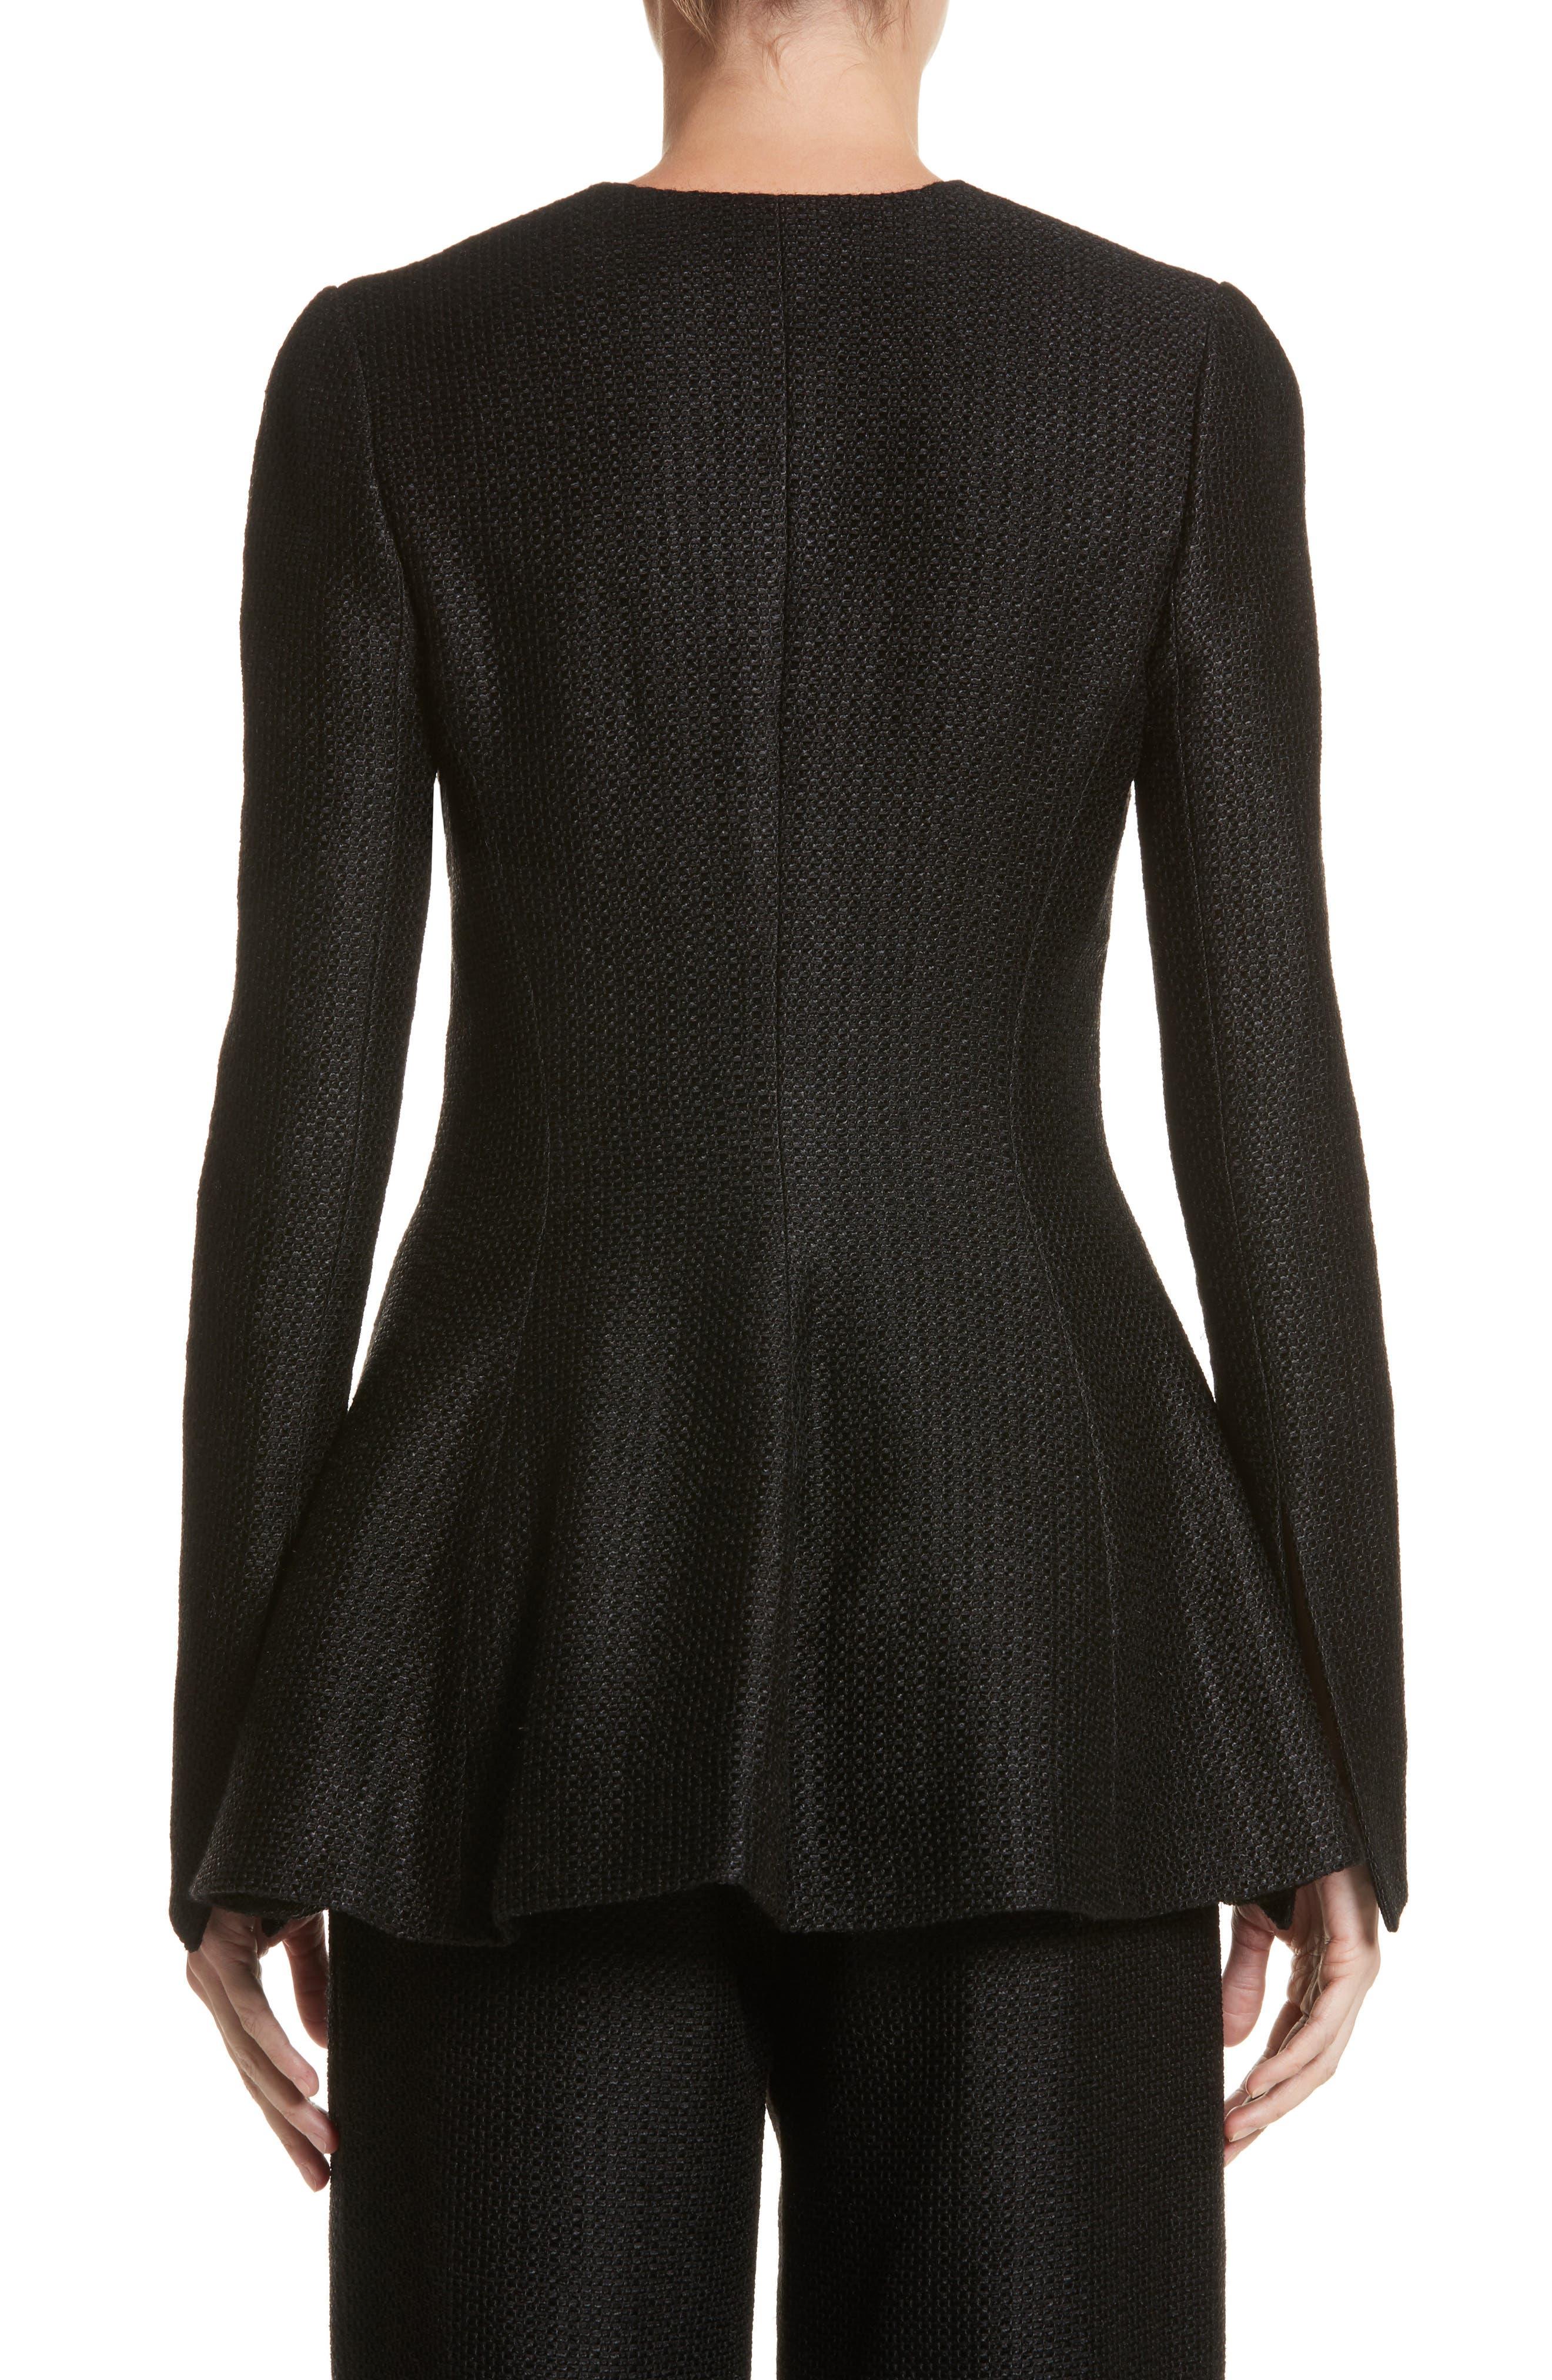 Linen & Silk Blend Tweed Jacket,                             Alternate thumbnail 2, color,                             001